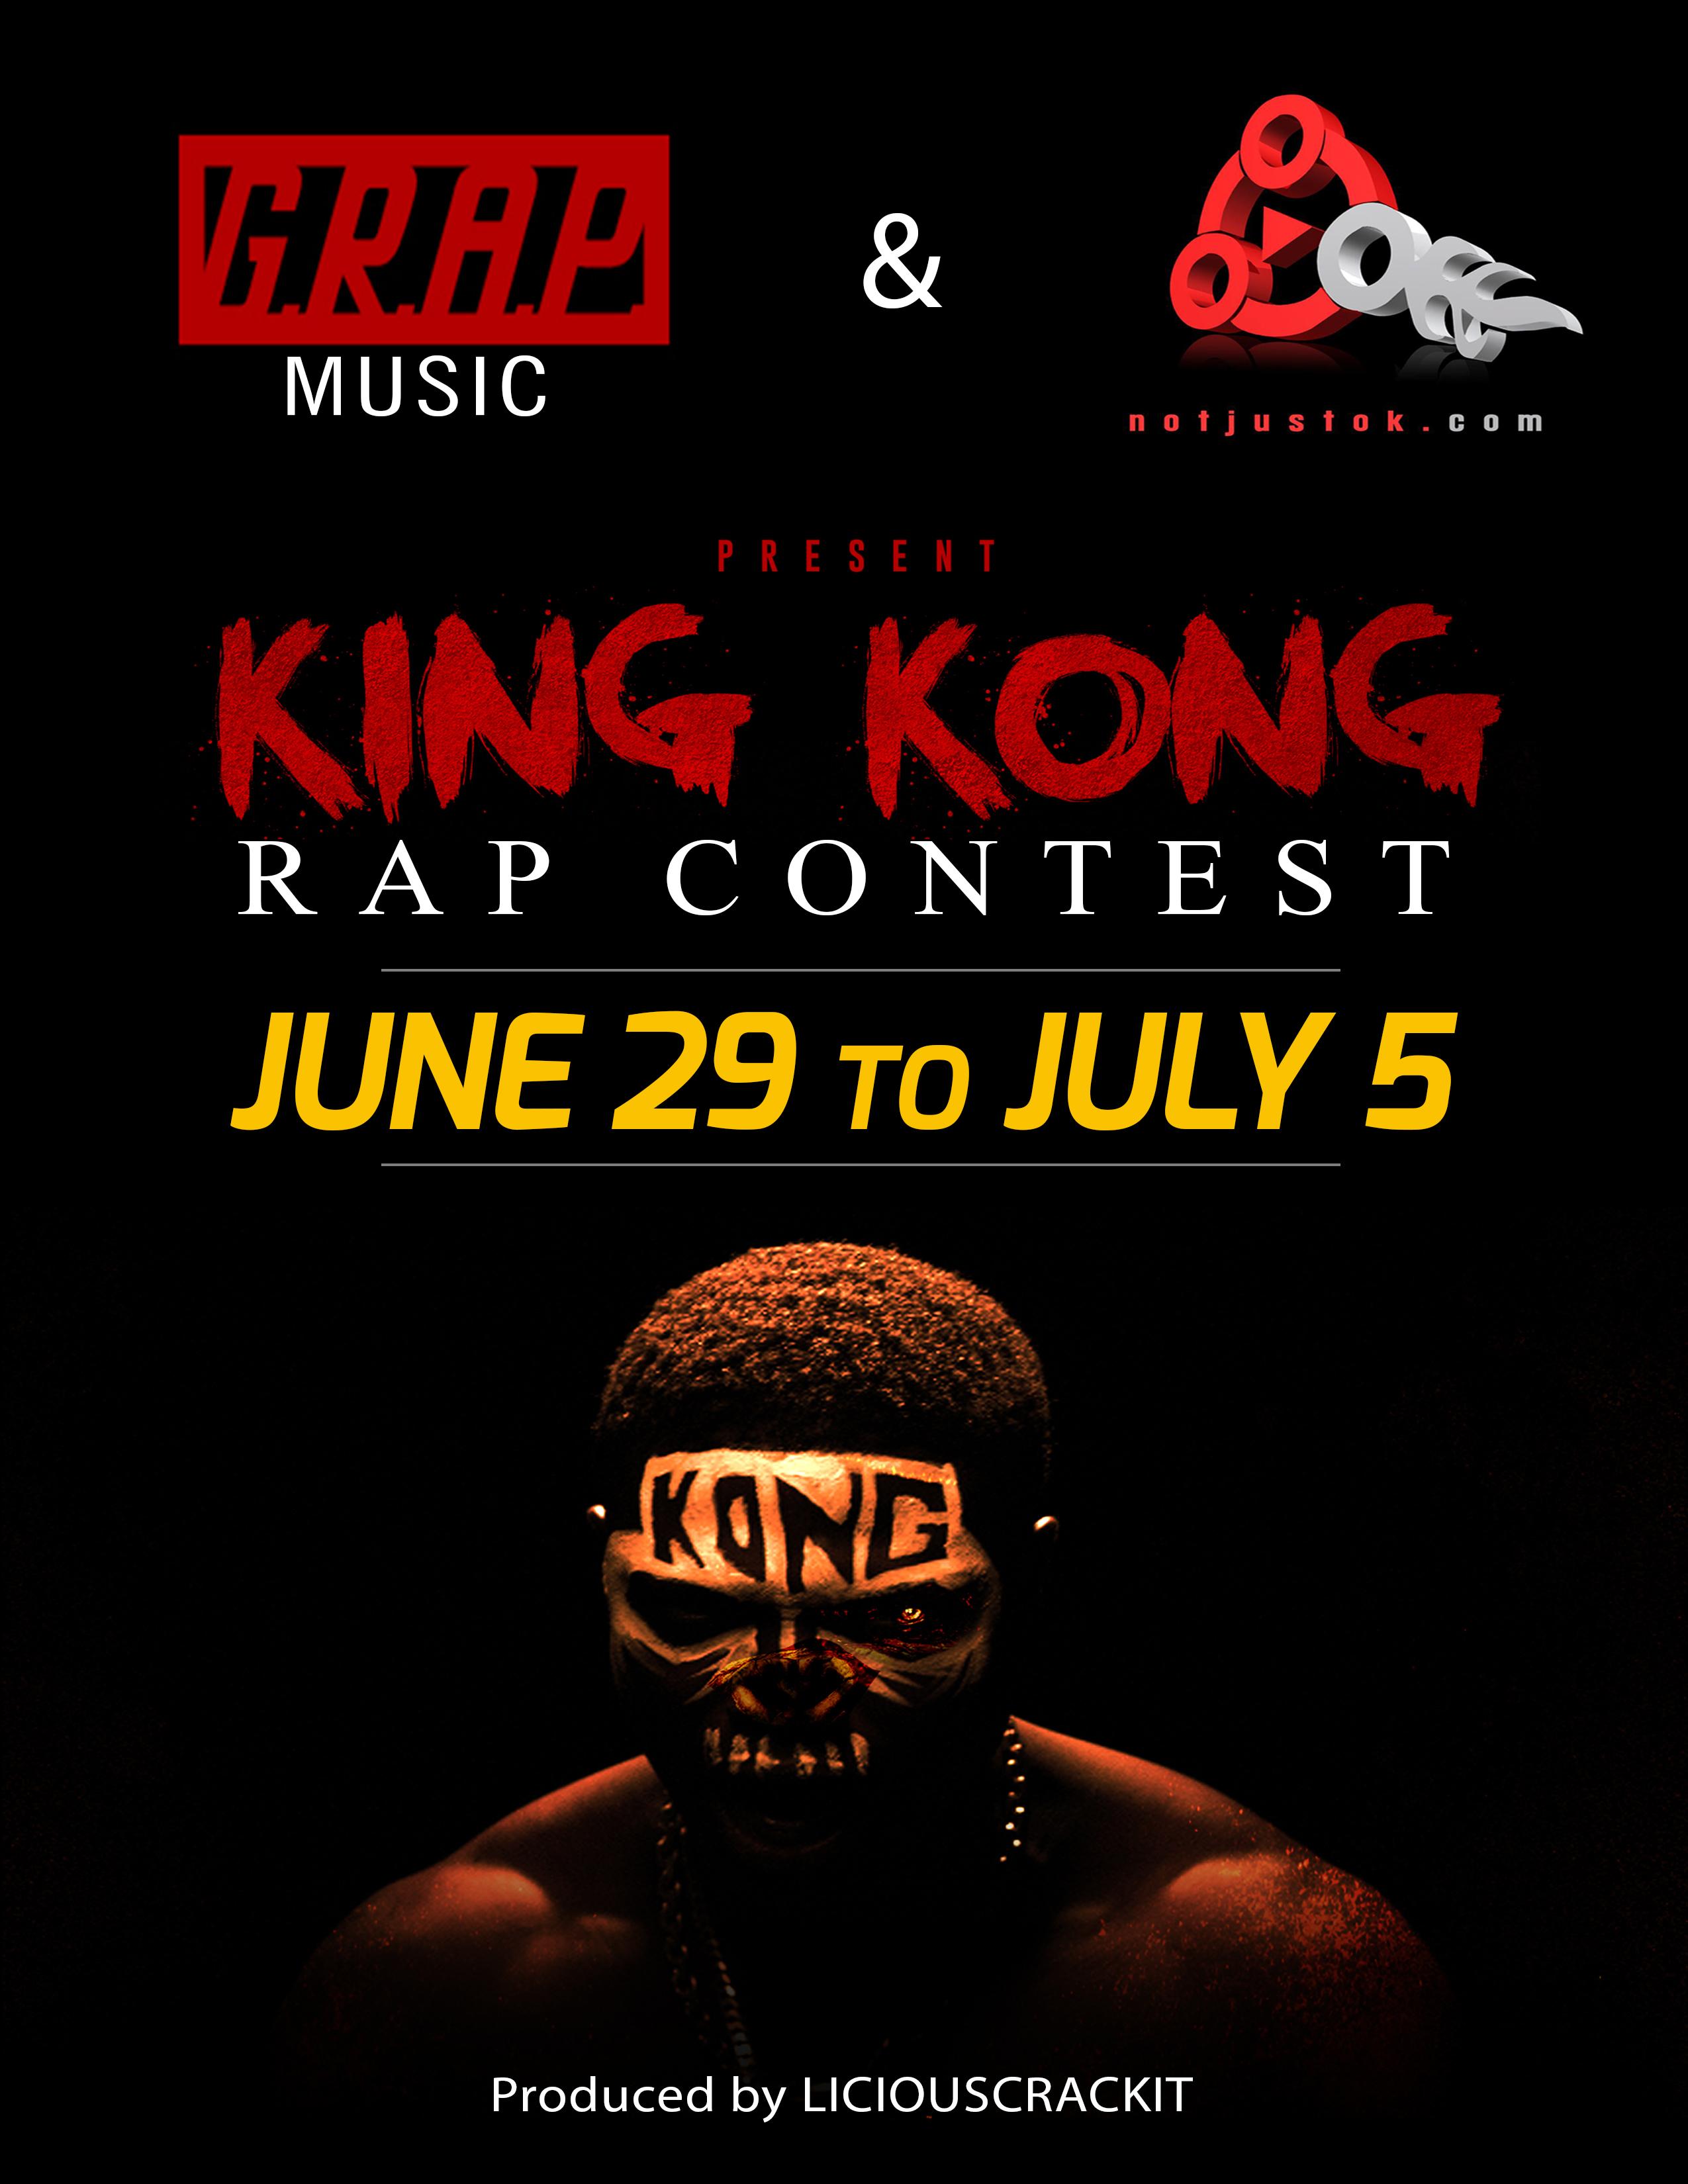 Notjustok com and G R A P Music Present: King Kong Rap